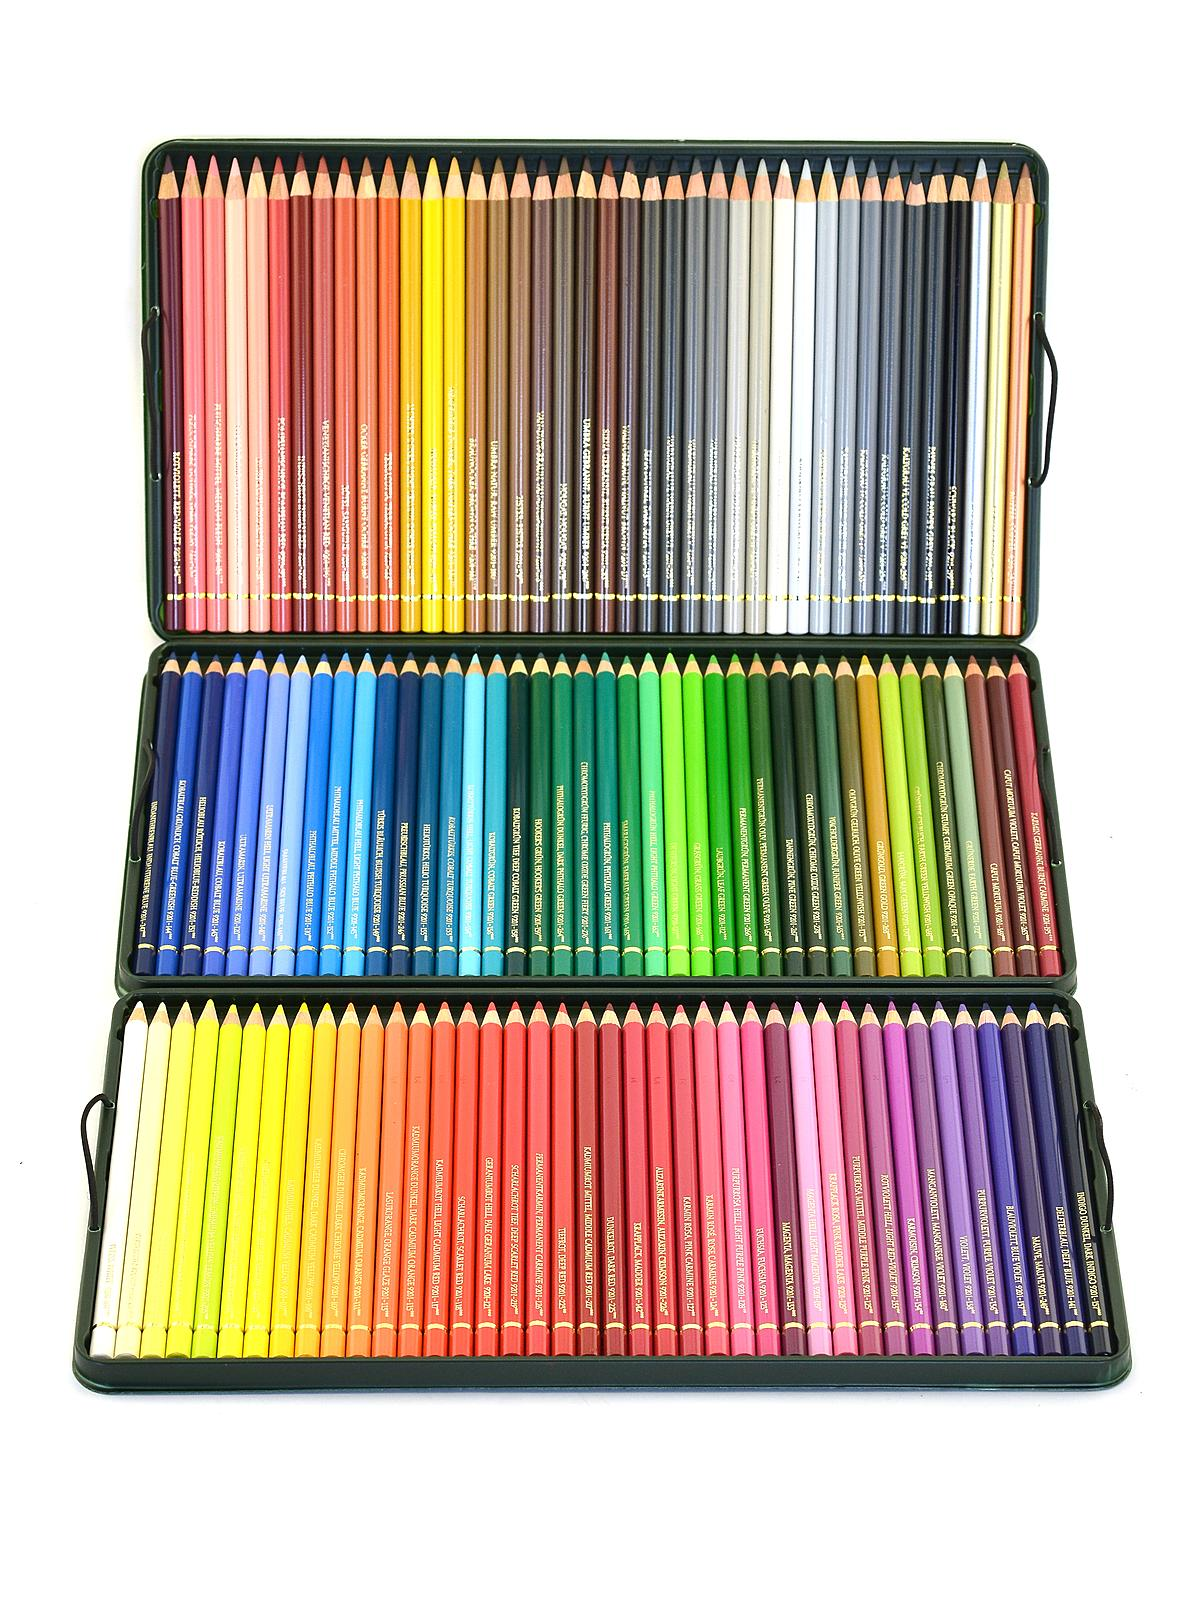 Polychromos Colored Pencil Sets